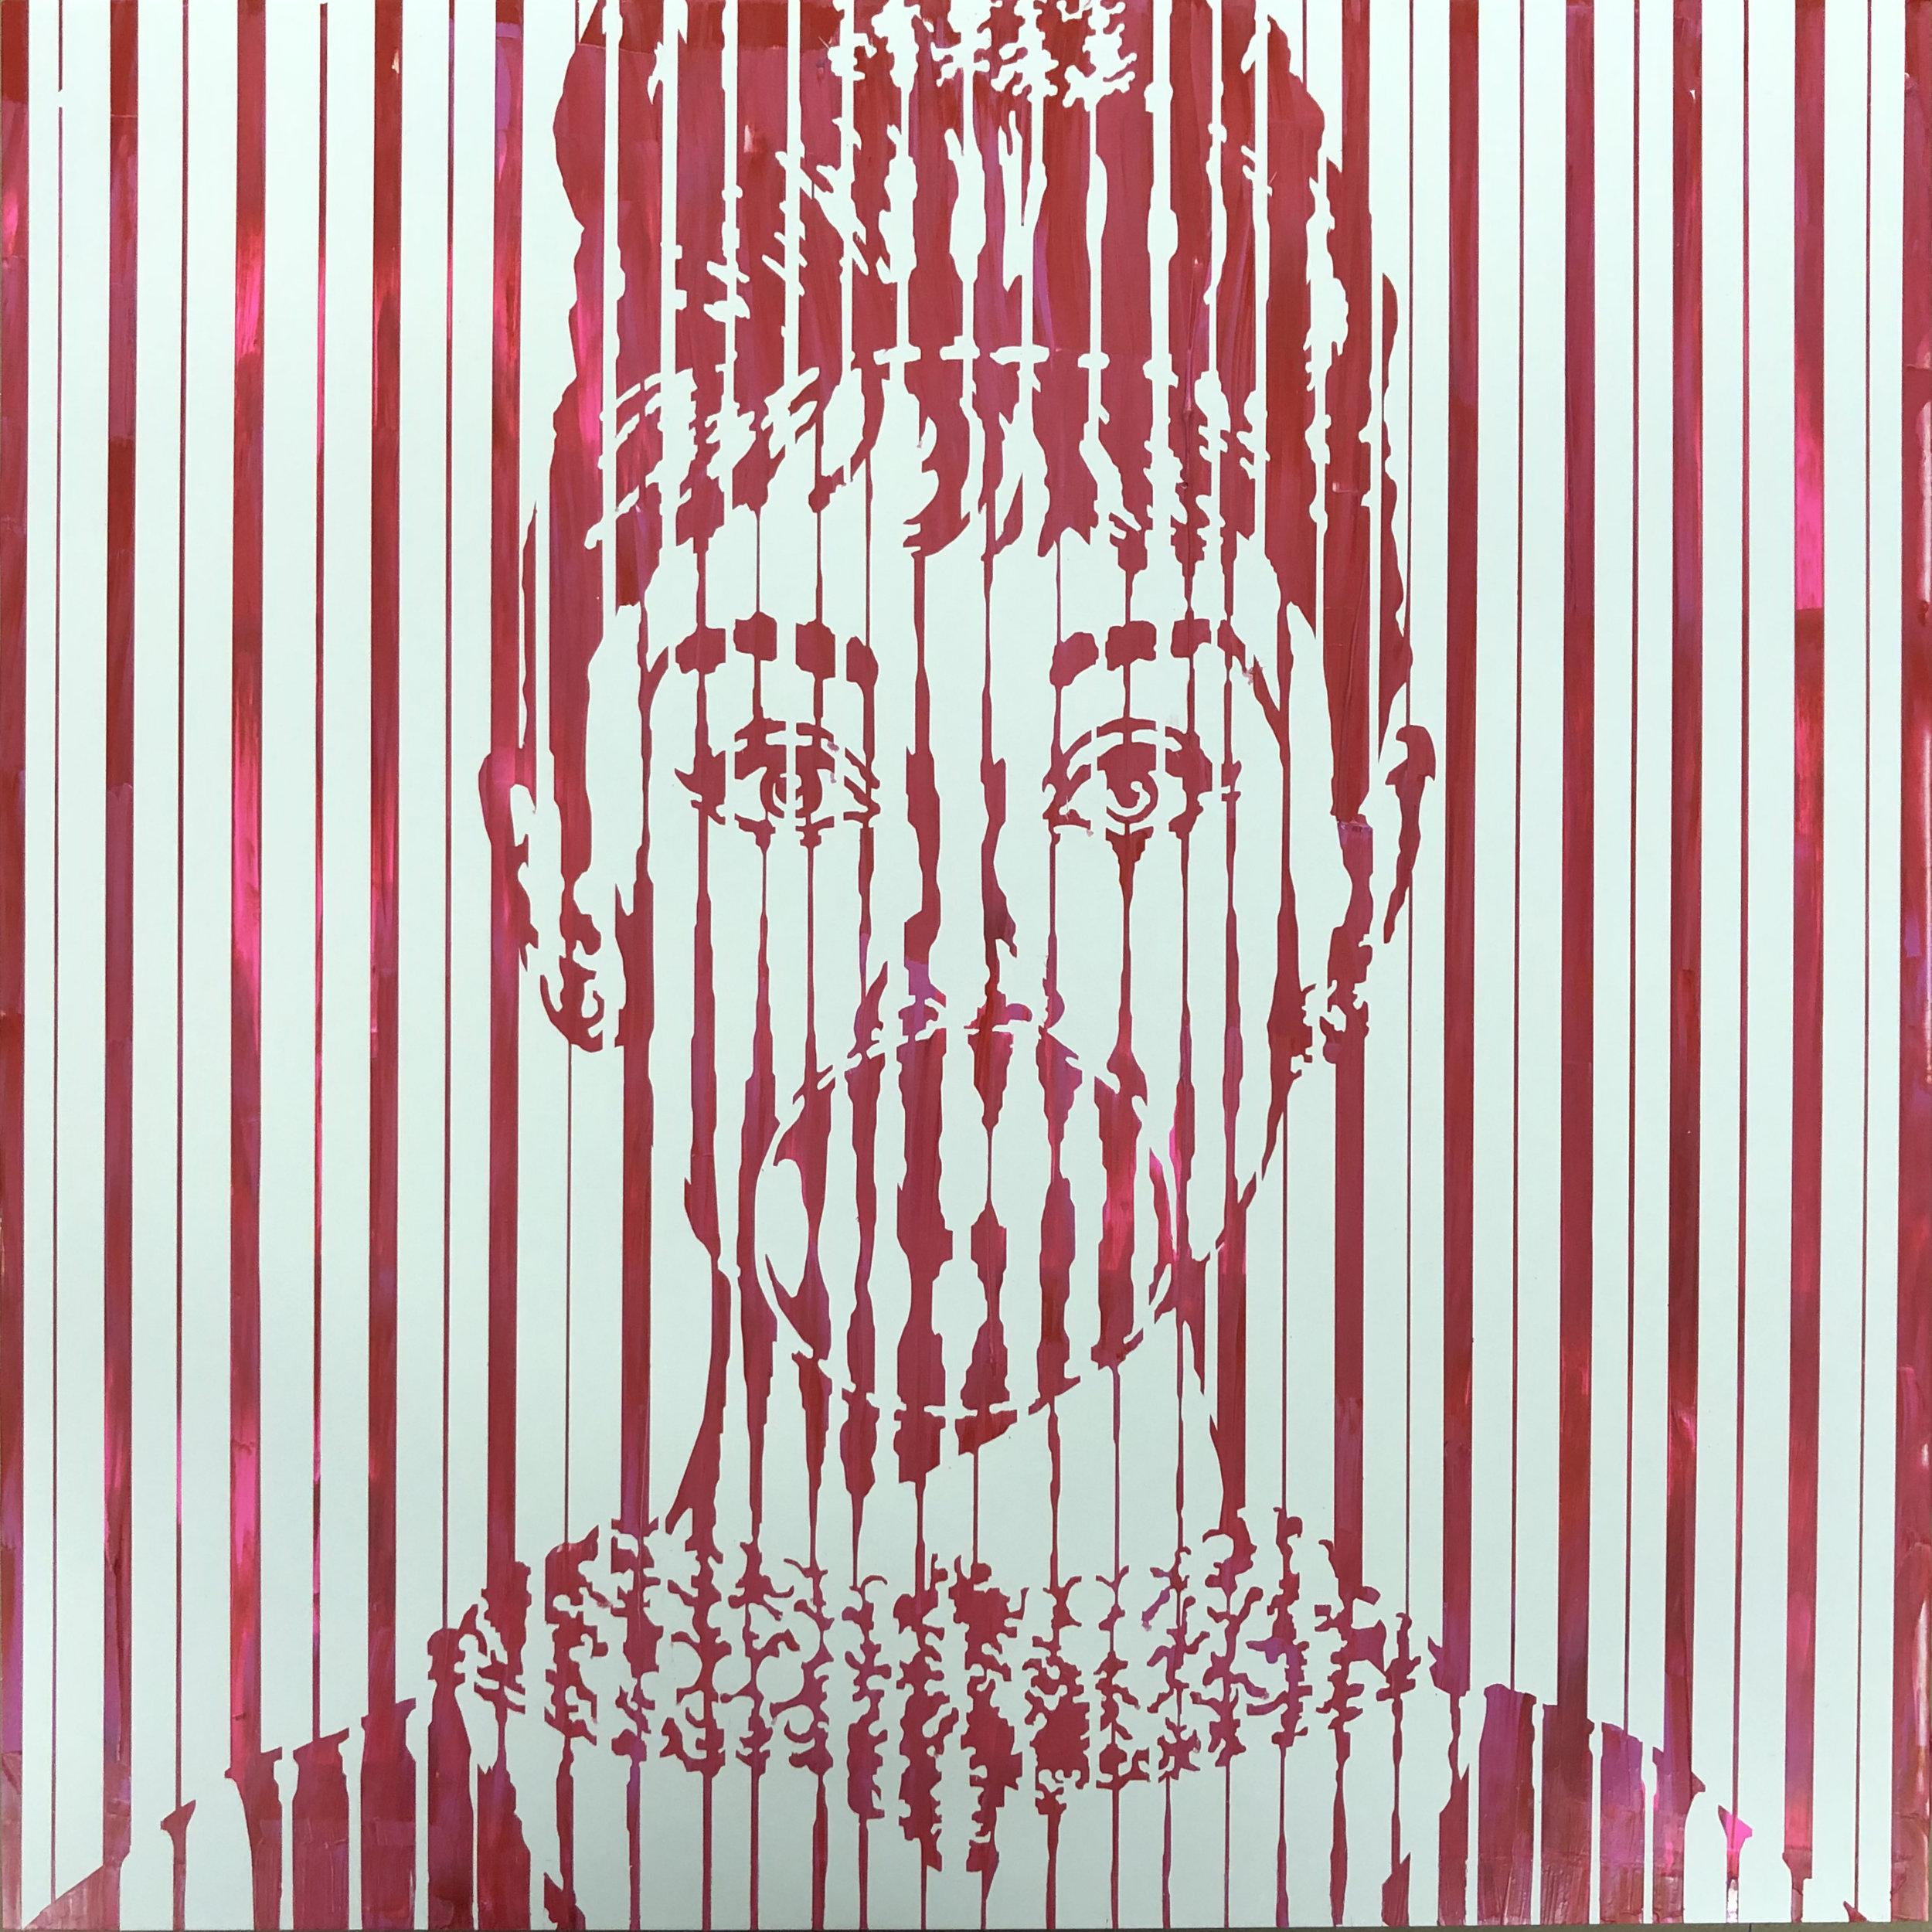 Sean Christopher Ward - Bubble Pop Audrey IV - Acrylic on Wood Panel - 16x16x1.5 - 2018 - 500.jpg